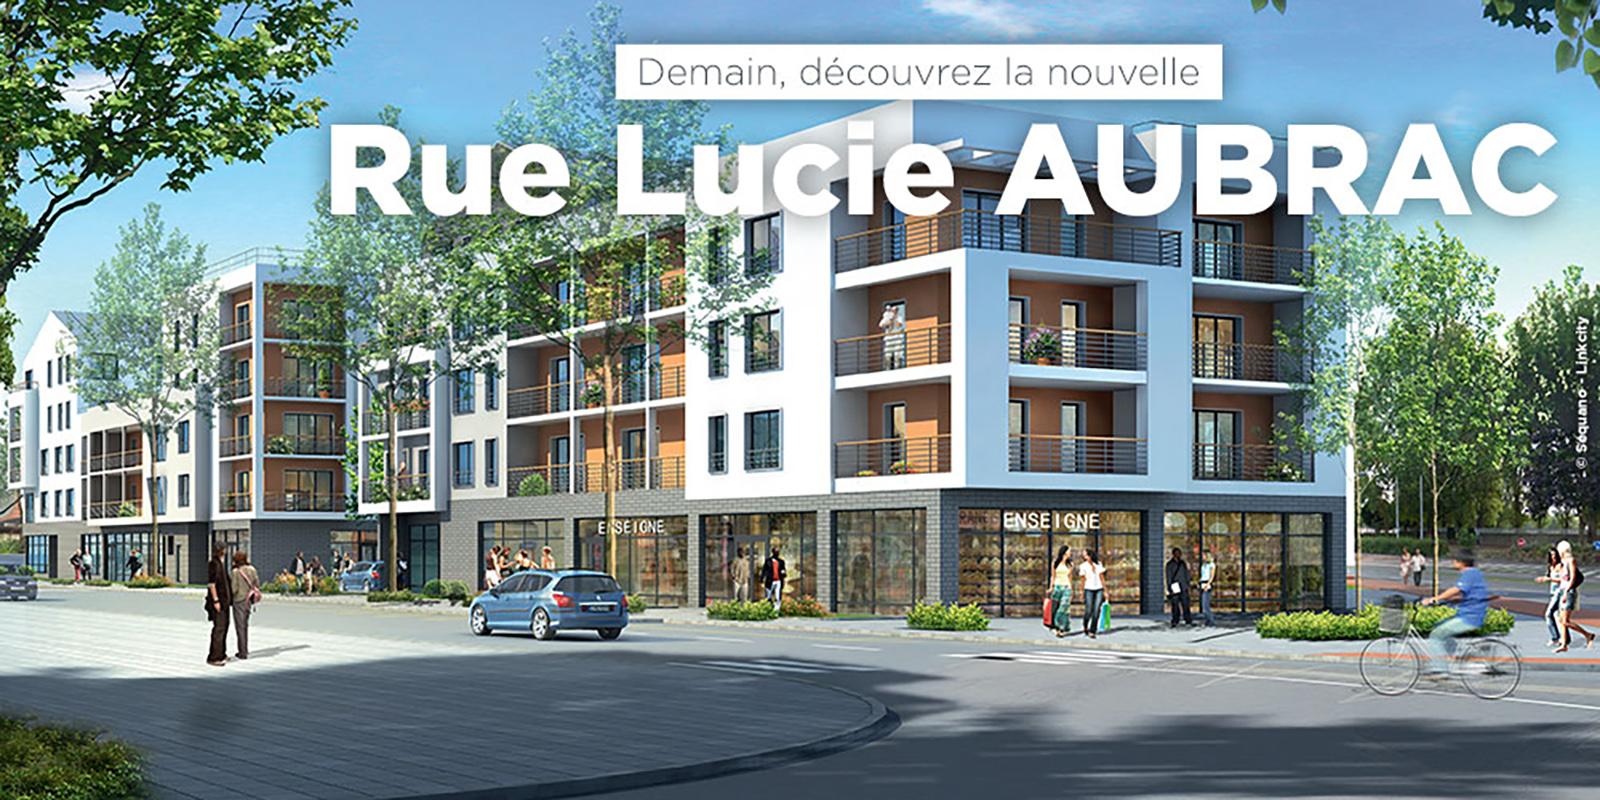 Rue Lucie AUBRAC dénomination